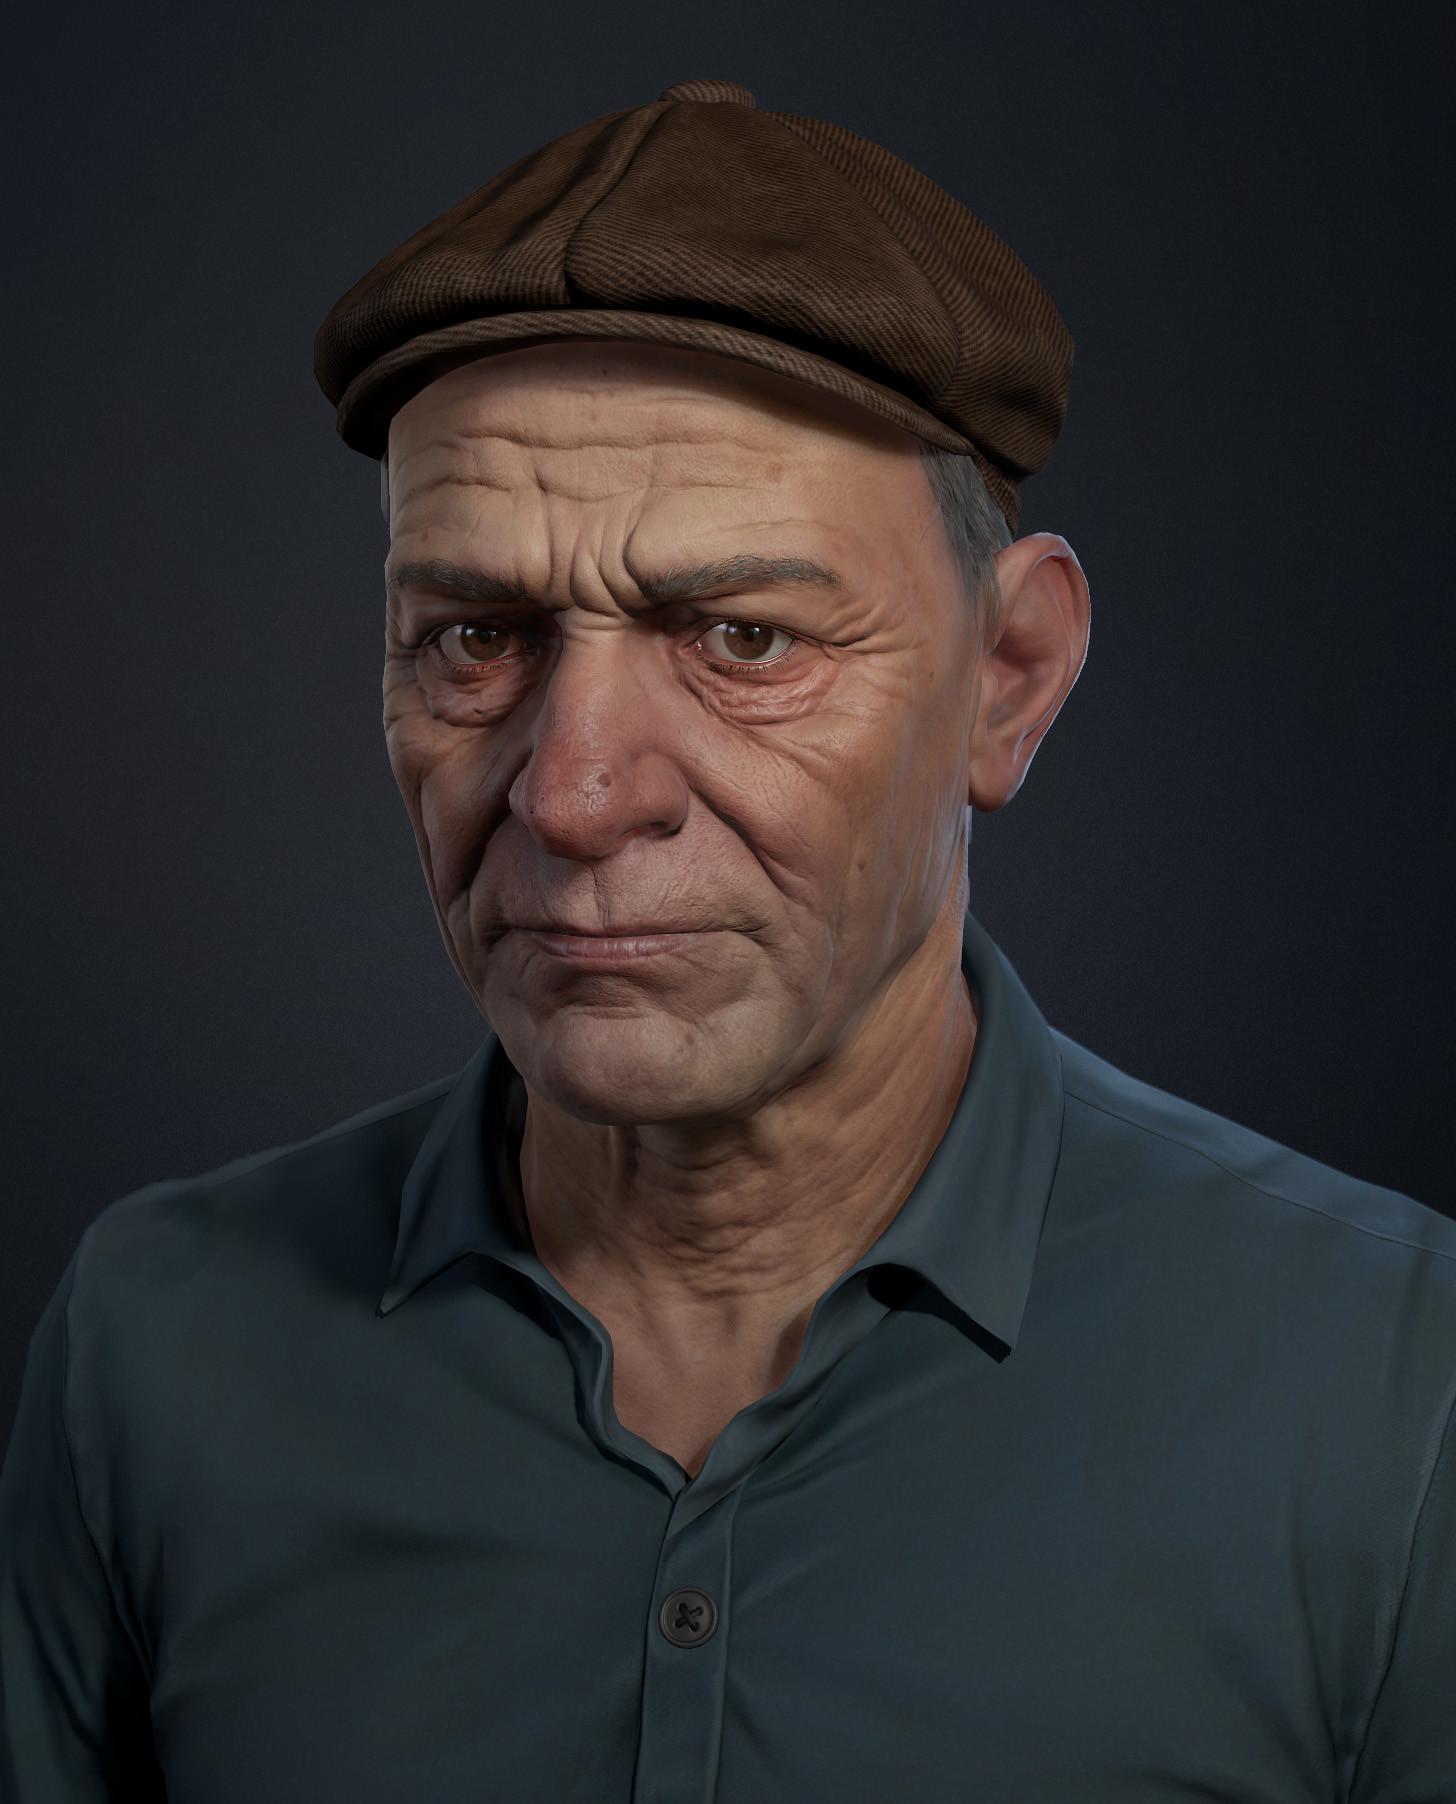 Pavel protasov peasant portrait